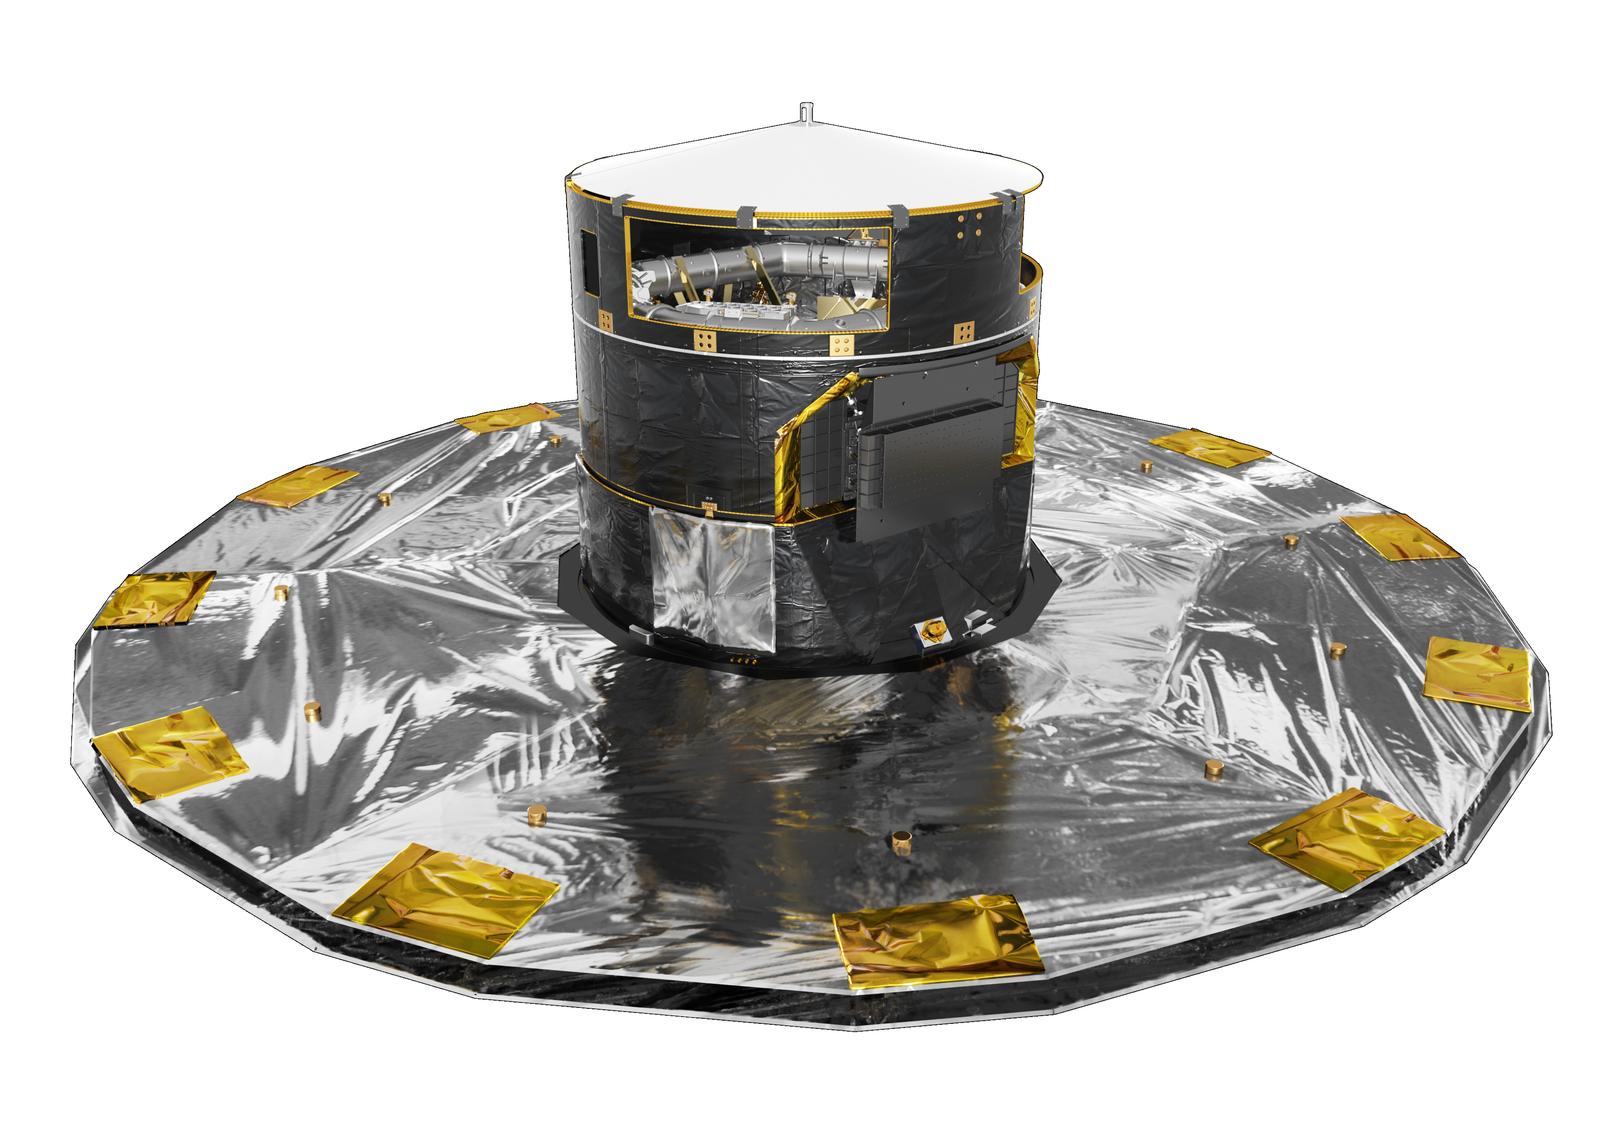 gaia spacecraft mission - photo #9